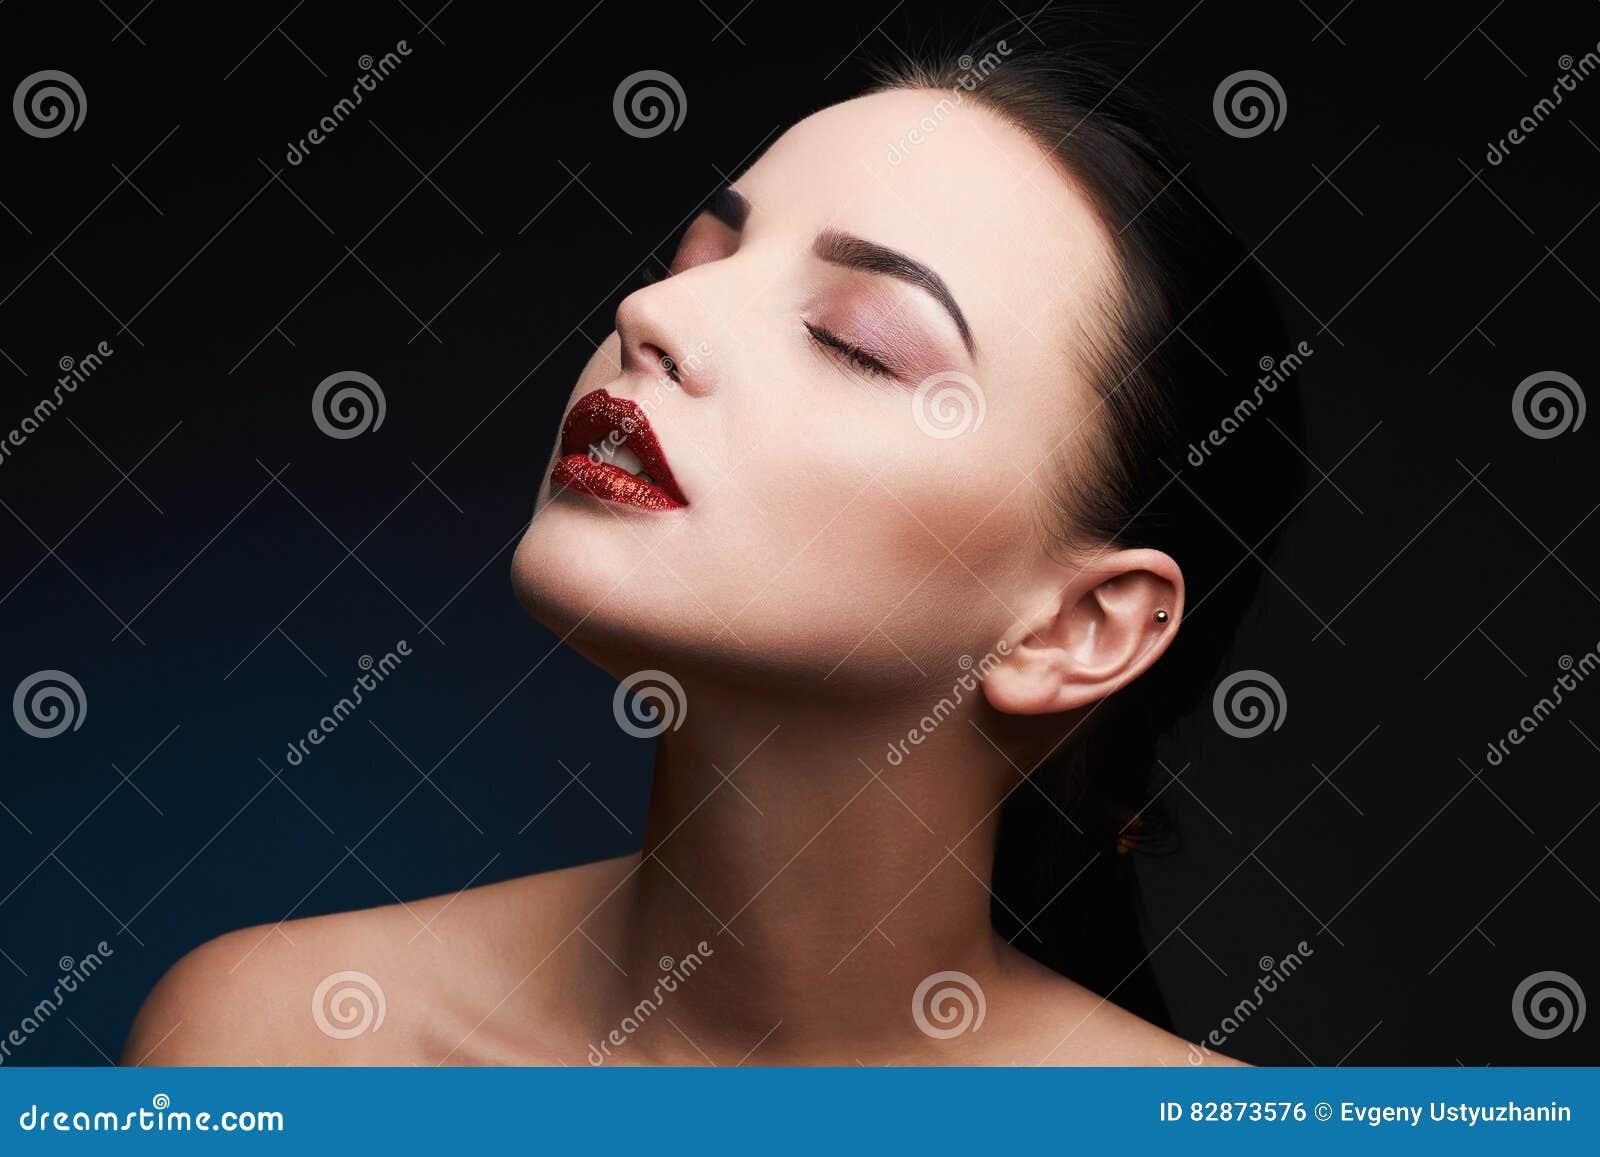 Beauty Model Woman.Beautiful Gorgeous Glamour Lady Portrait.Sexy Lips. Beauty Red Lips Makeup